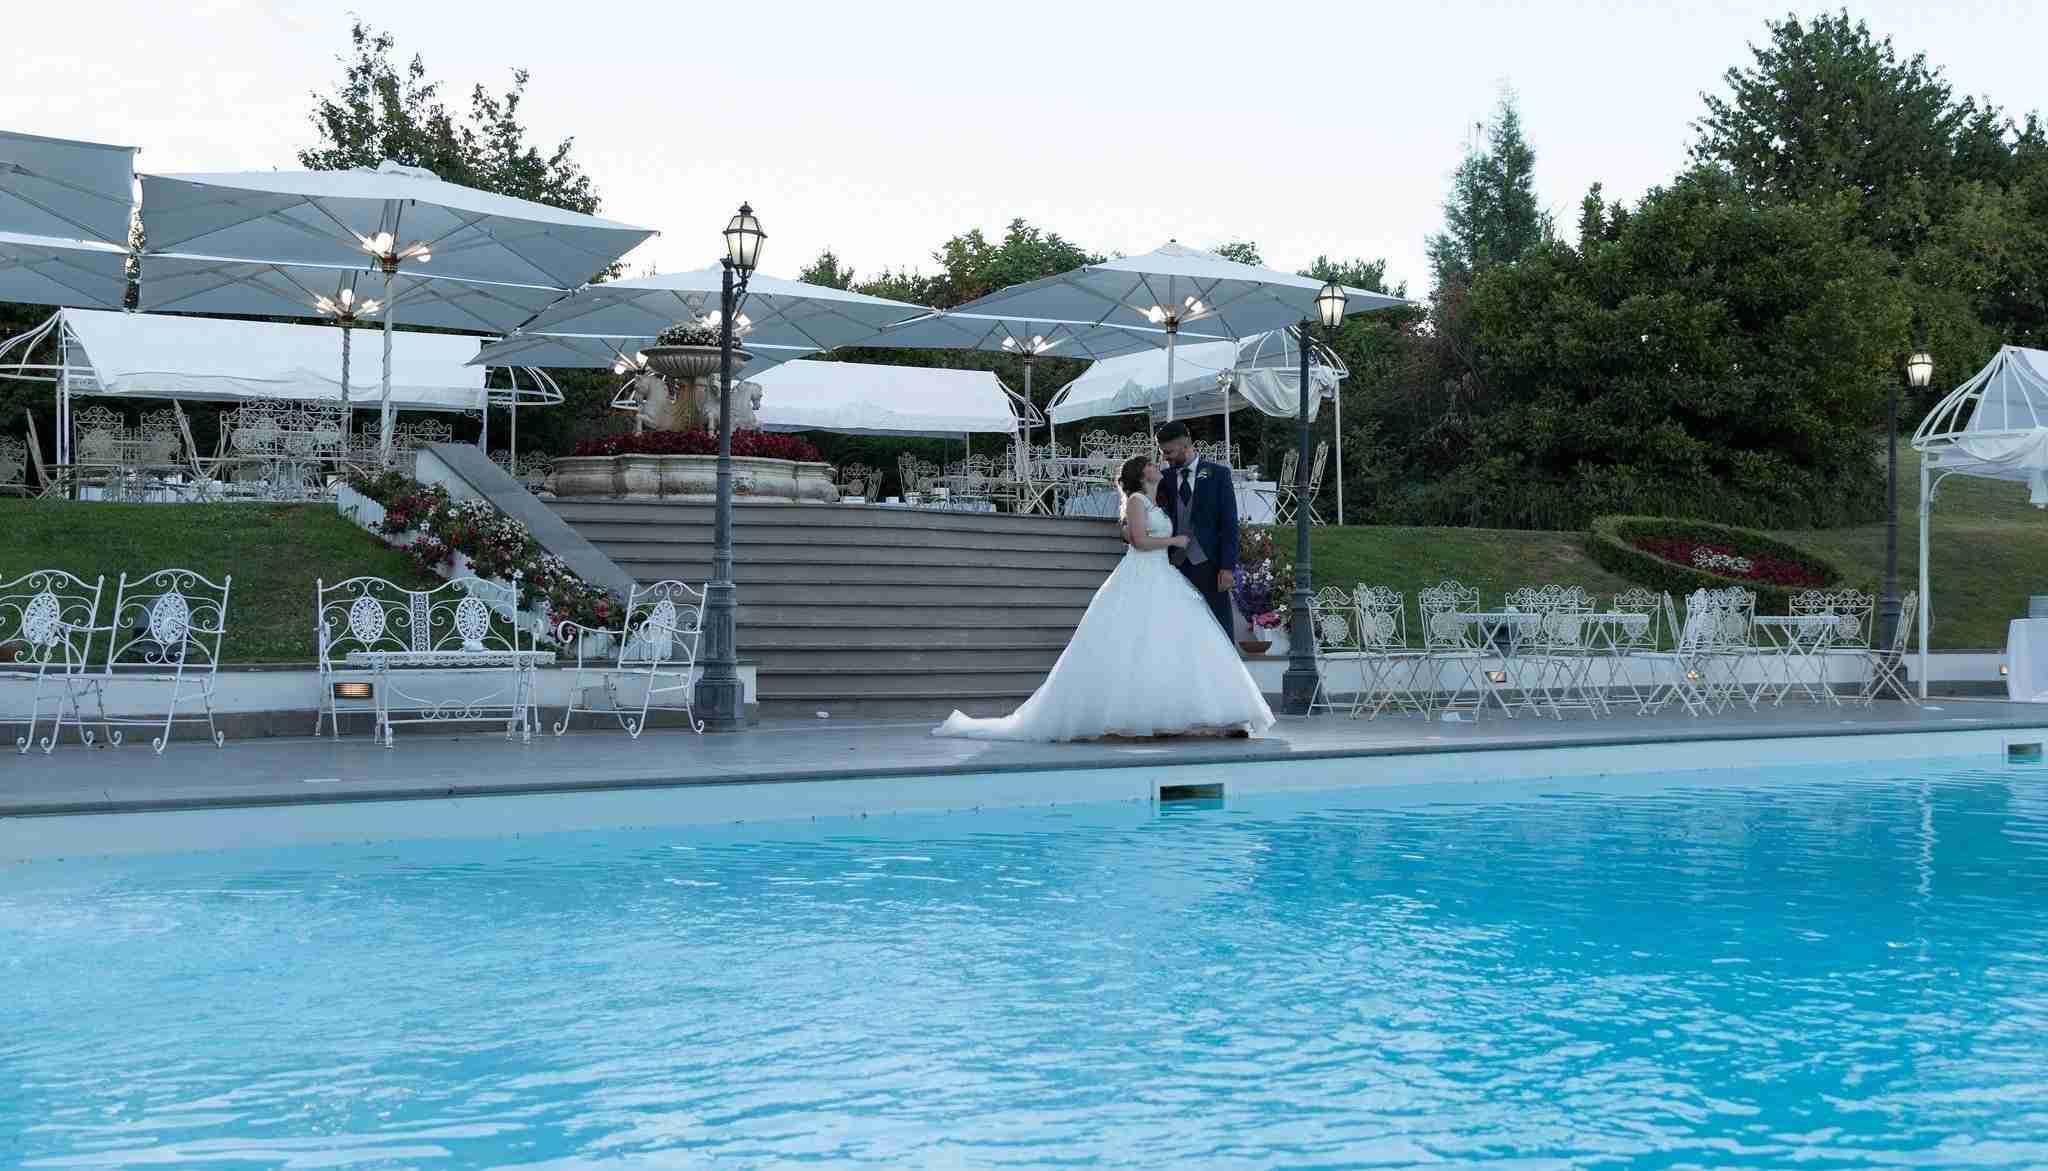 Matrimonio a Villa York: Esterni, piscina